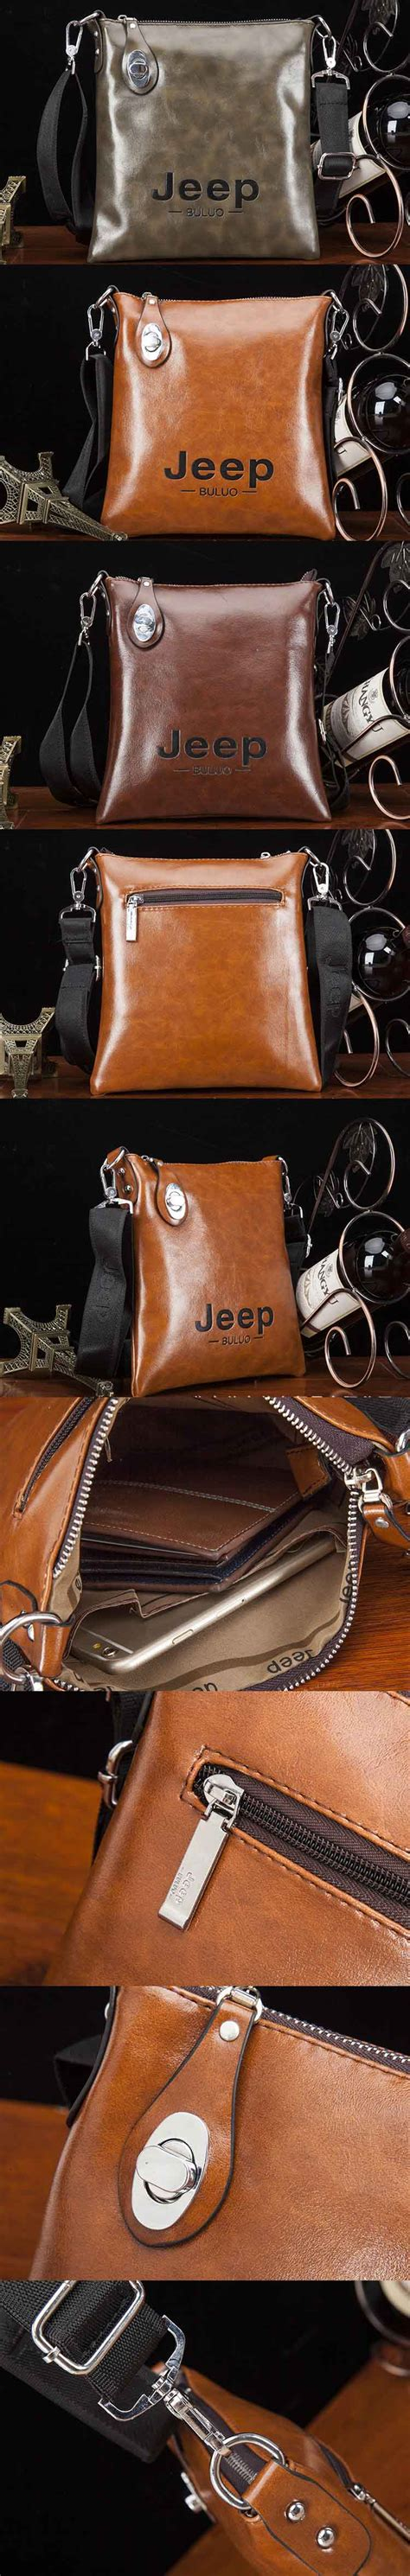 Sepatu Merk Jeep jual tas jeep